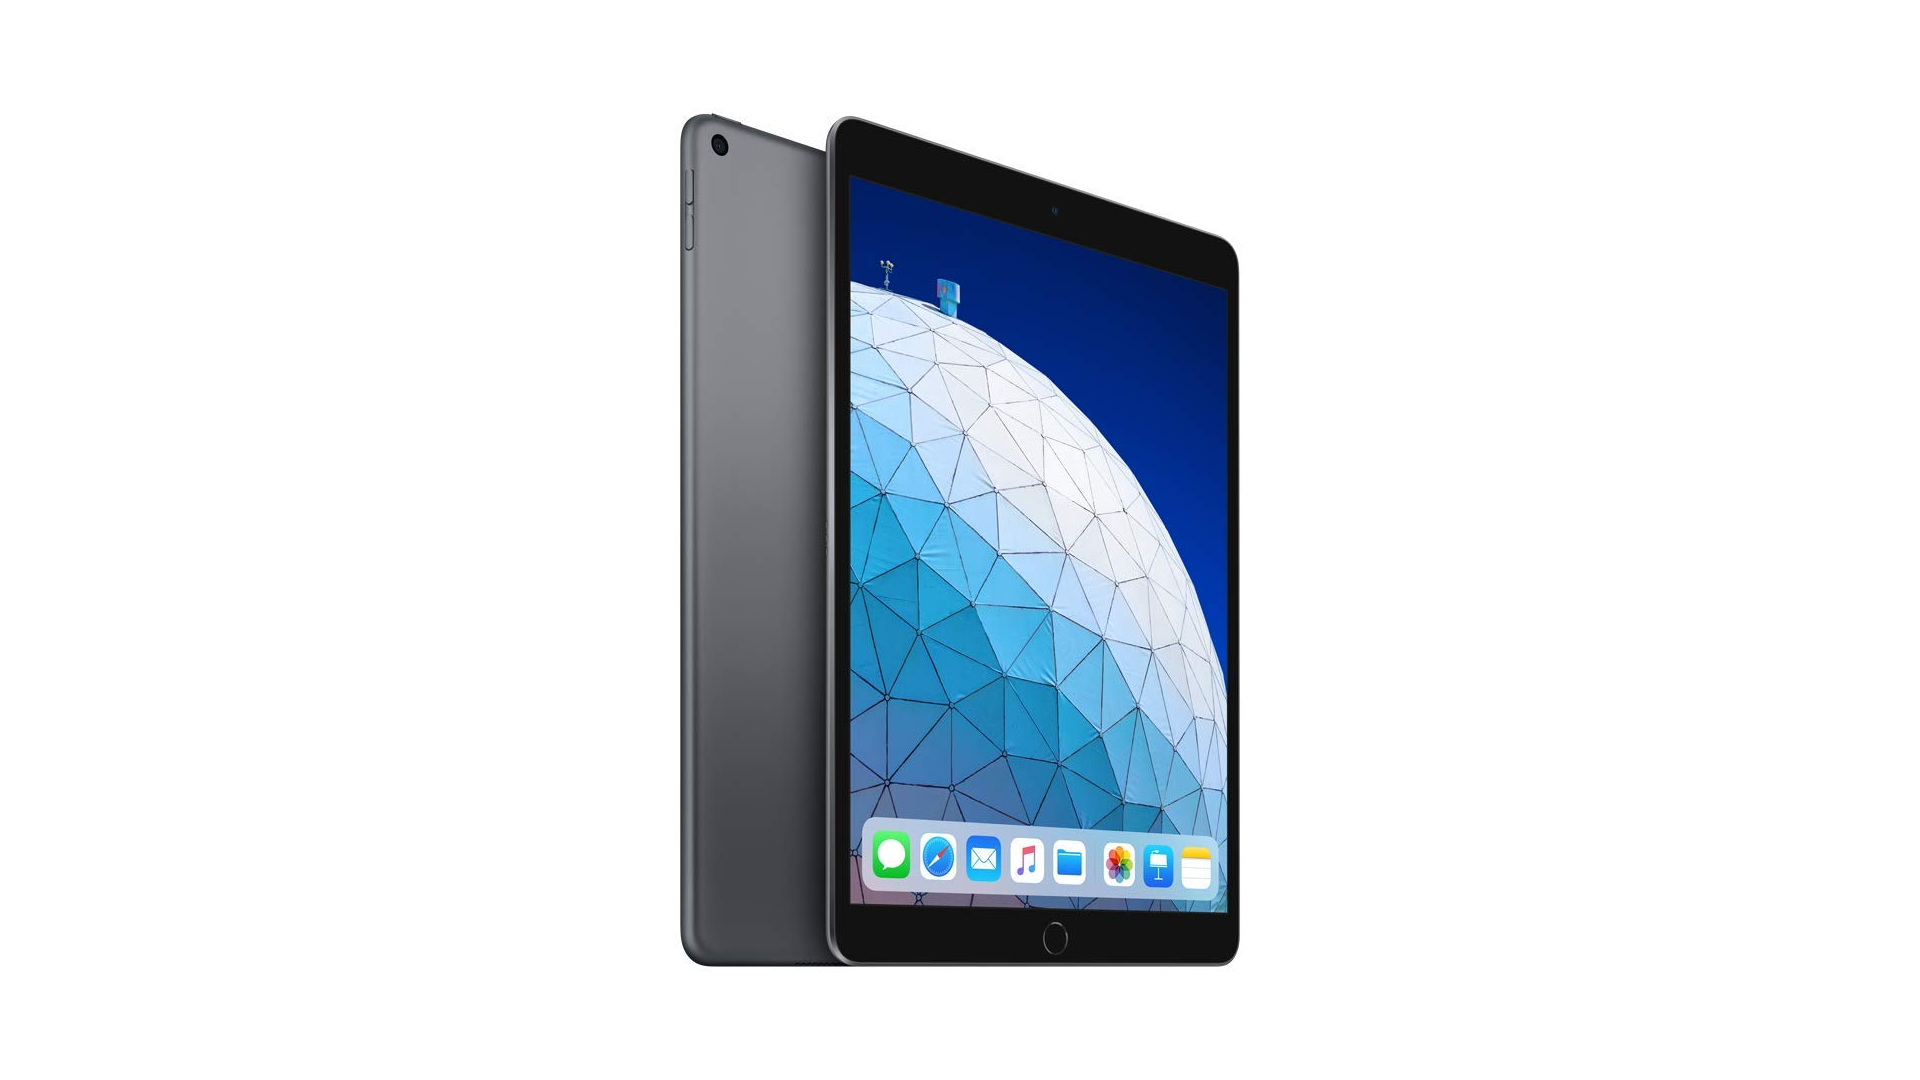 The iPad Air